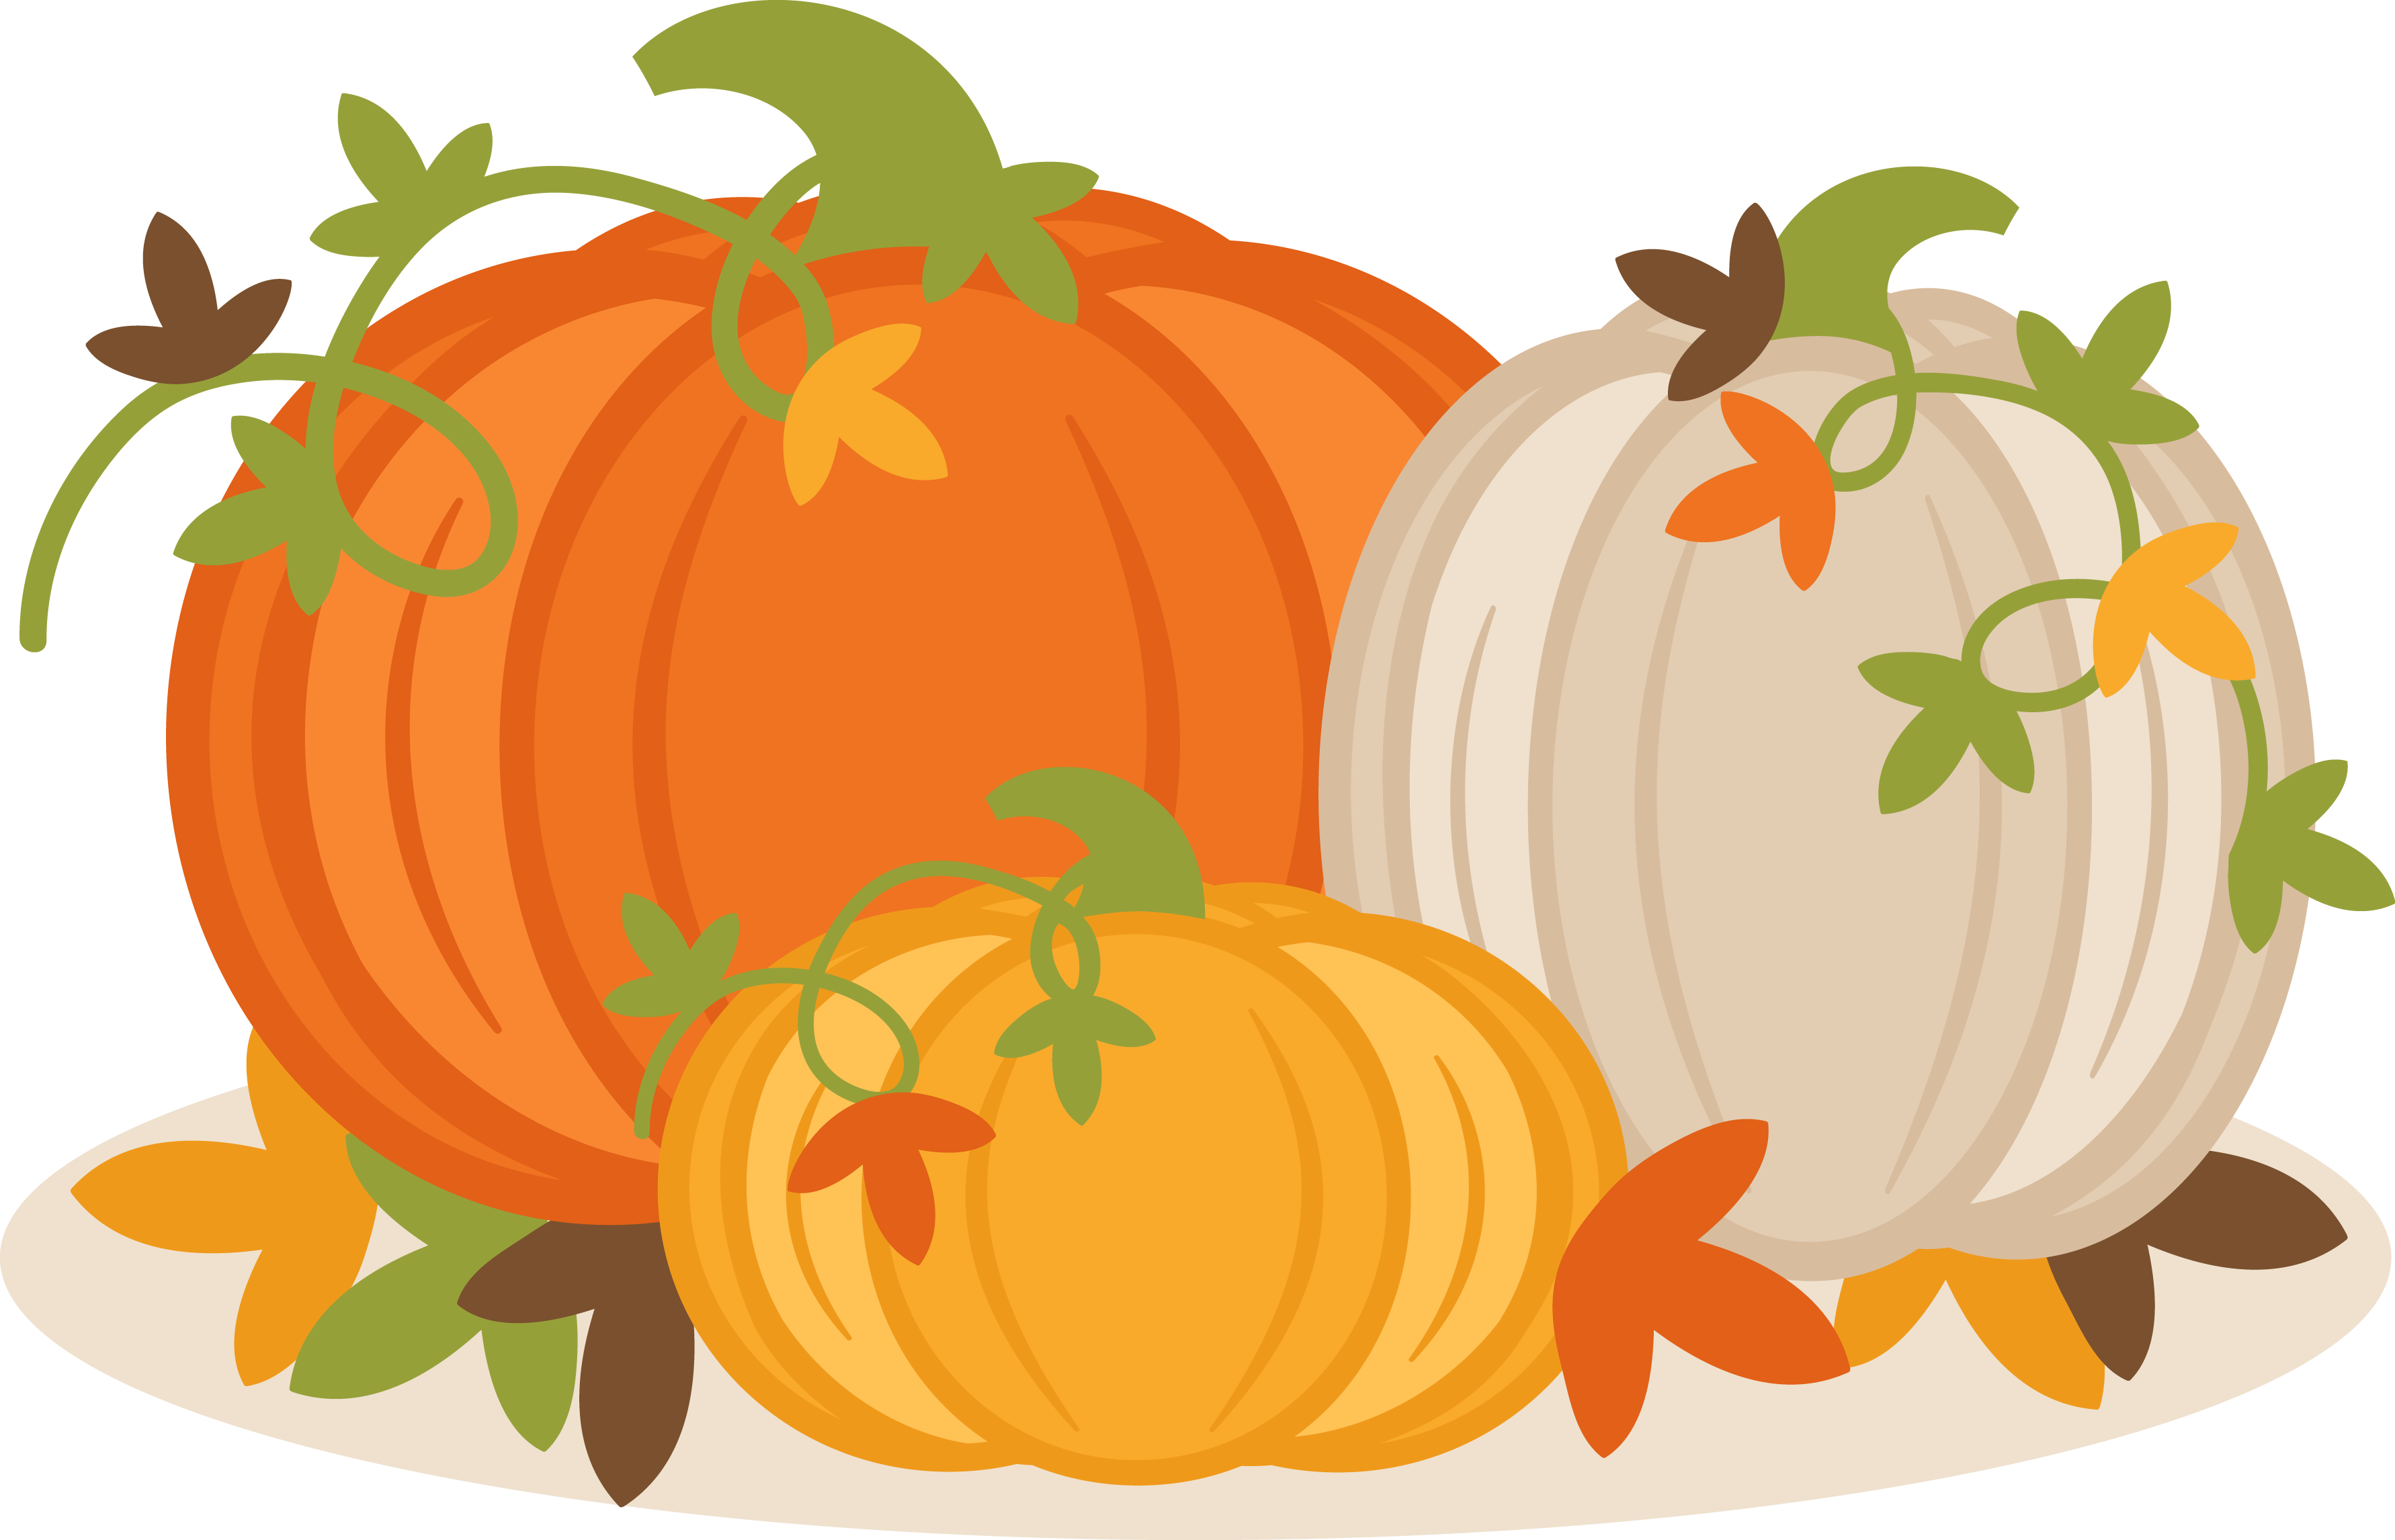 Clipart cutting pumpkin banner black and white stock MKC_FallPumpkinGroup_SVG | S_SVG_MKC_Miss Kate Cuttables | Pinterest ... banner black and white stock